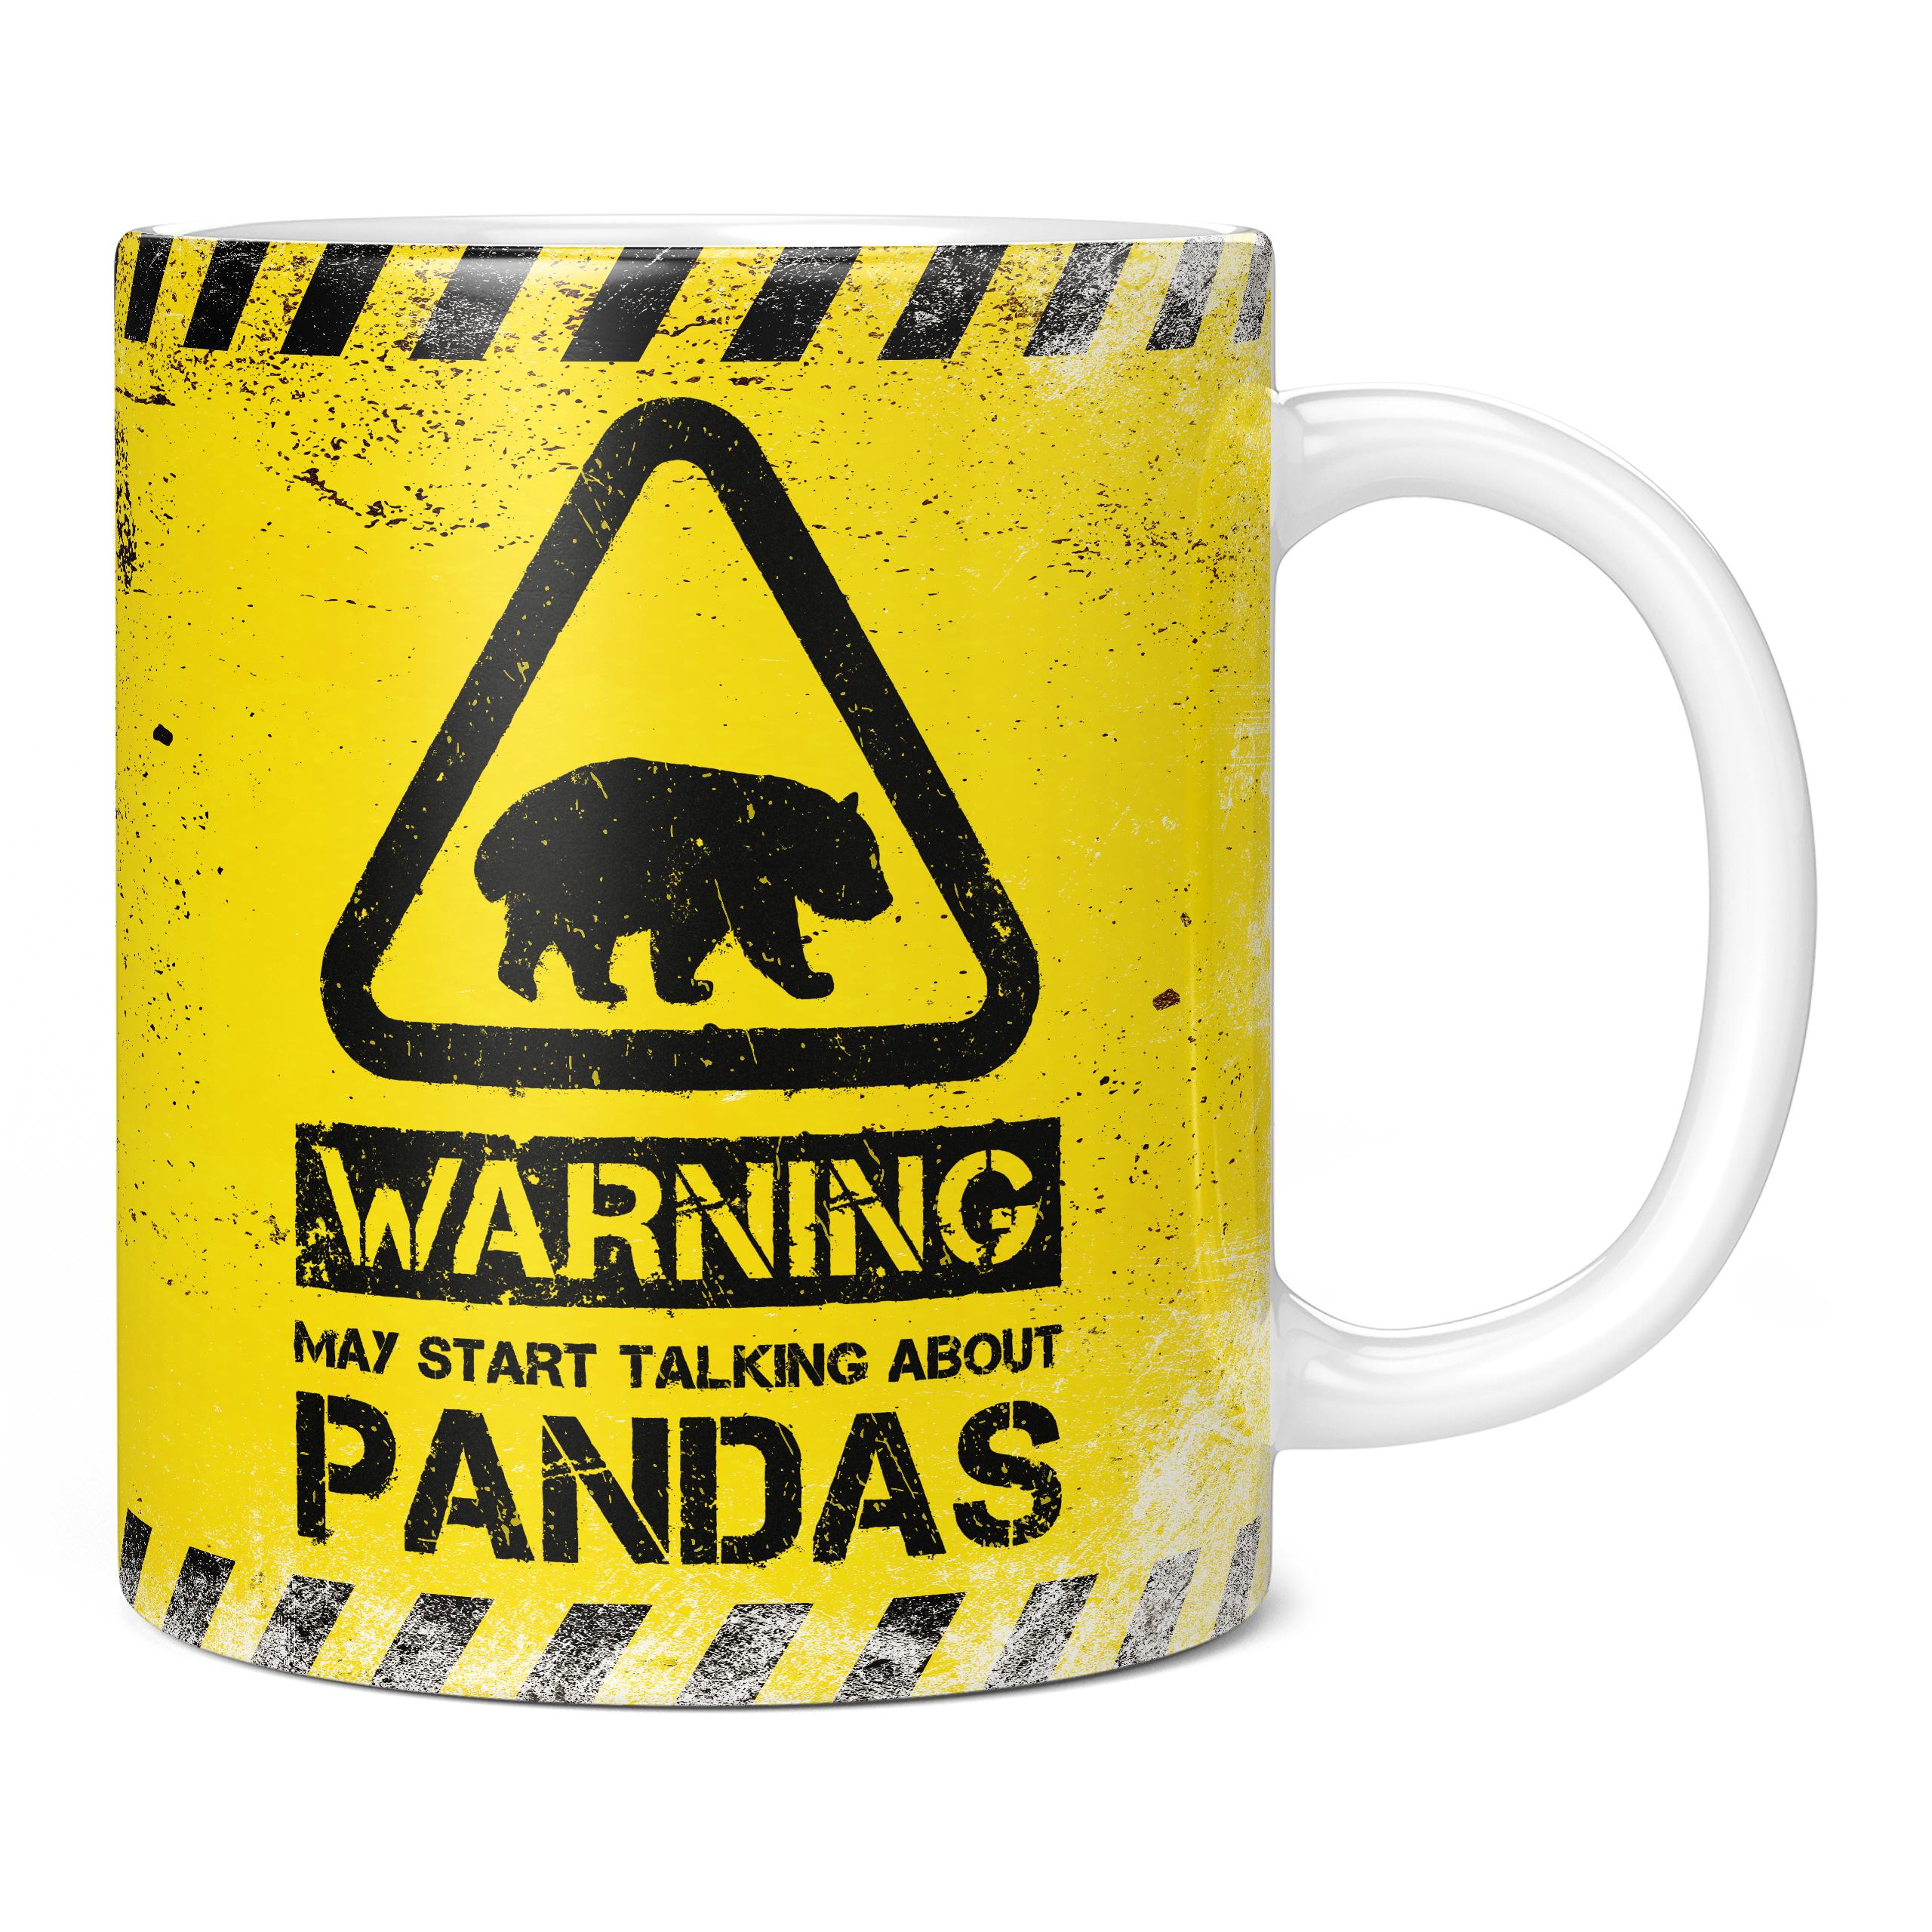 WARNING MAY START TALKING ABOUT PANDAS 11OZ NOVELTY MUG